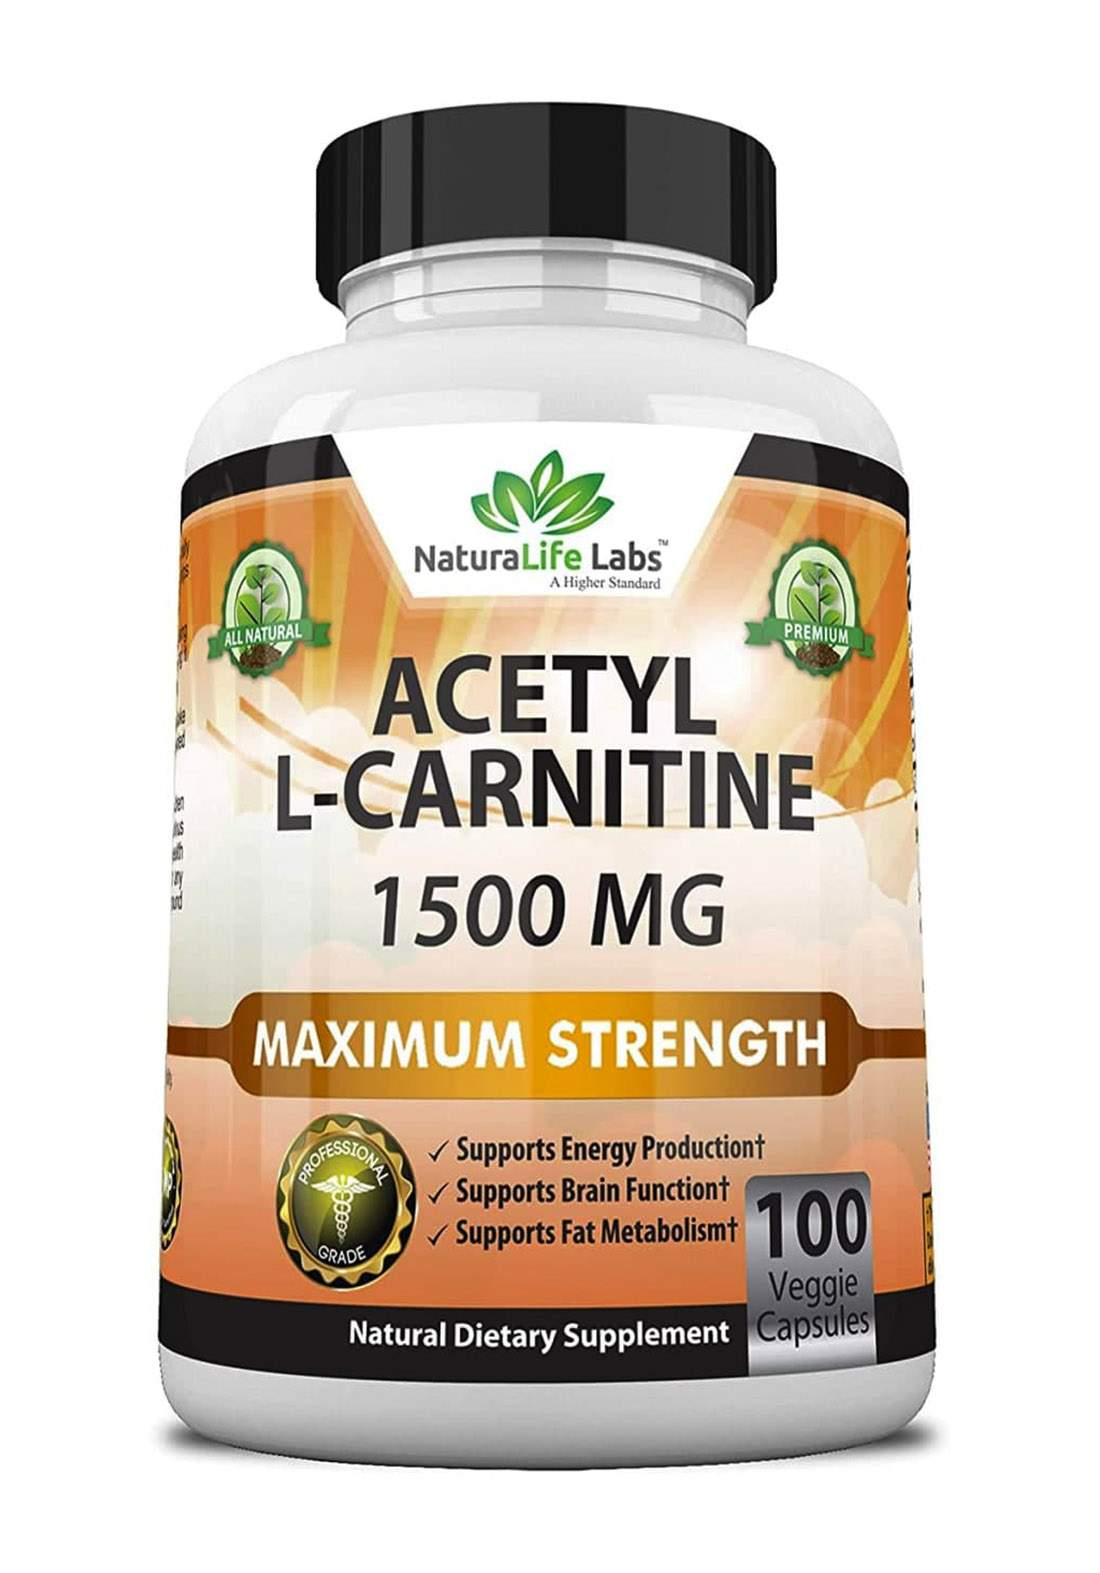 Nature Life Labs Astely L-Carntine(1000MG) 100 Capsules مكمل غذائي 100 كبسولة